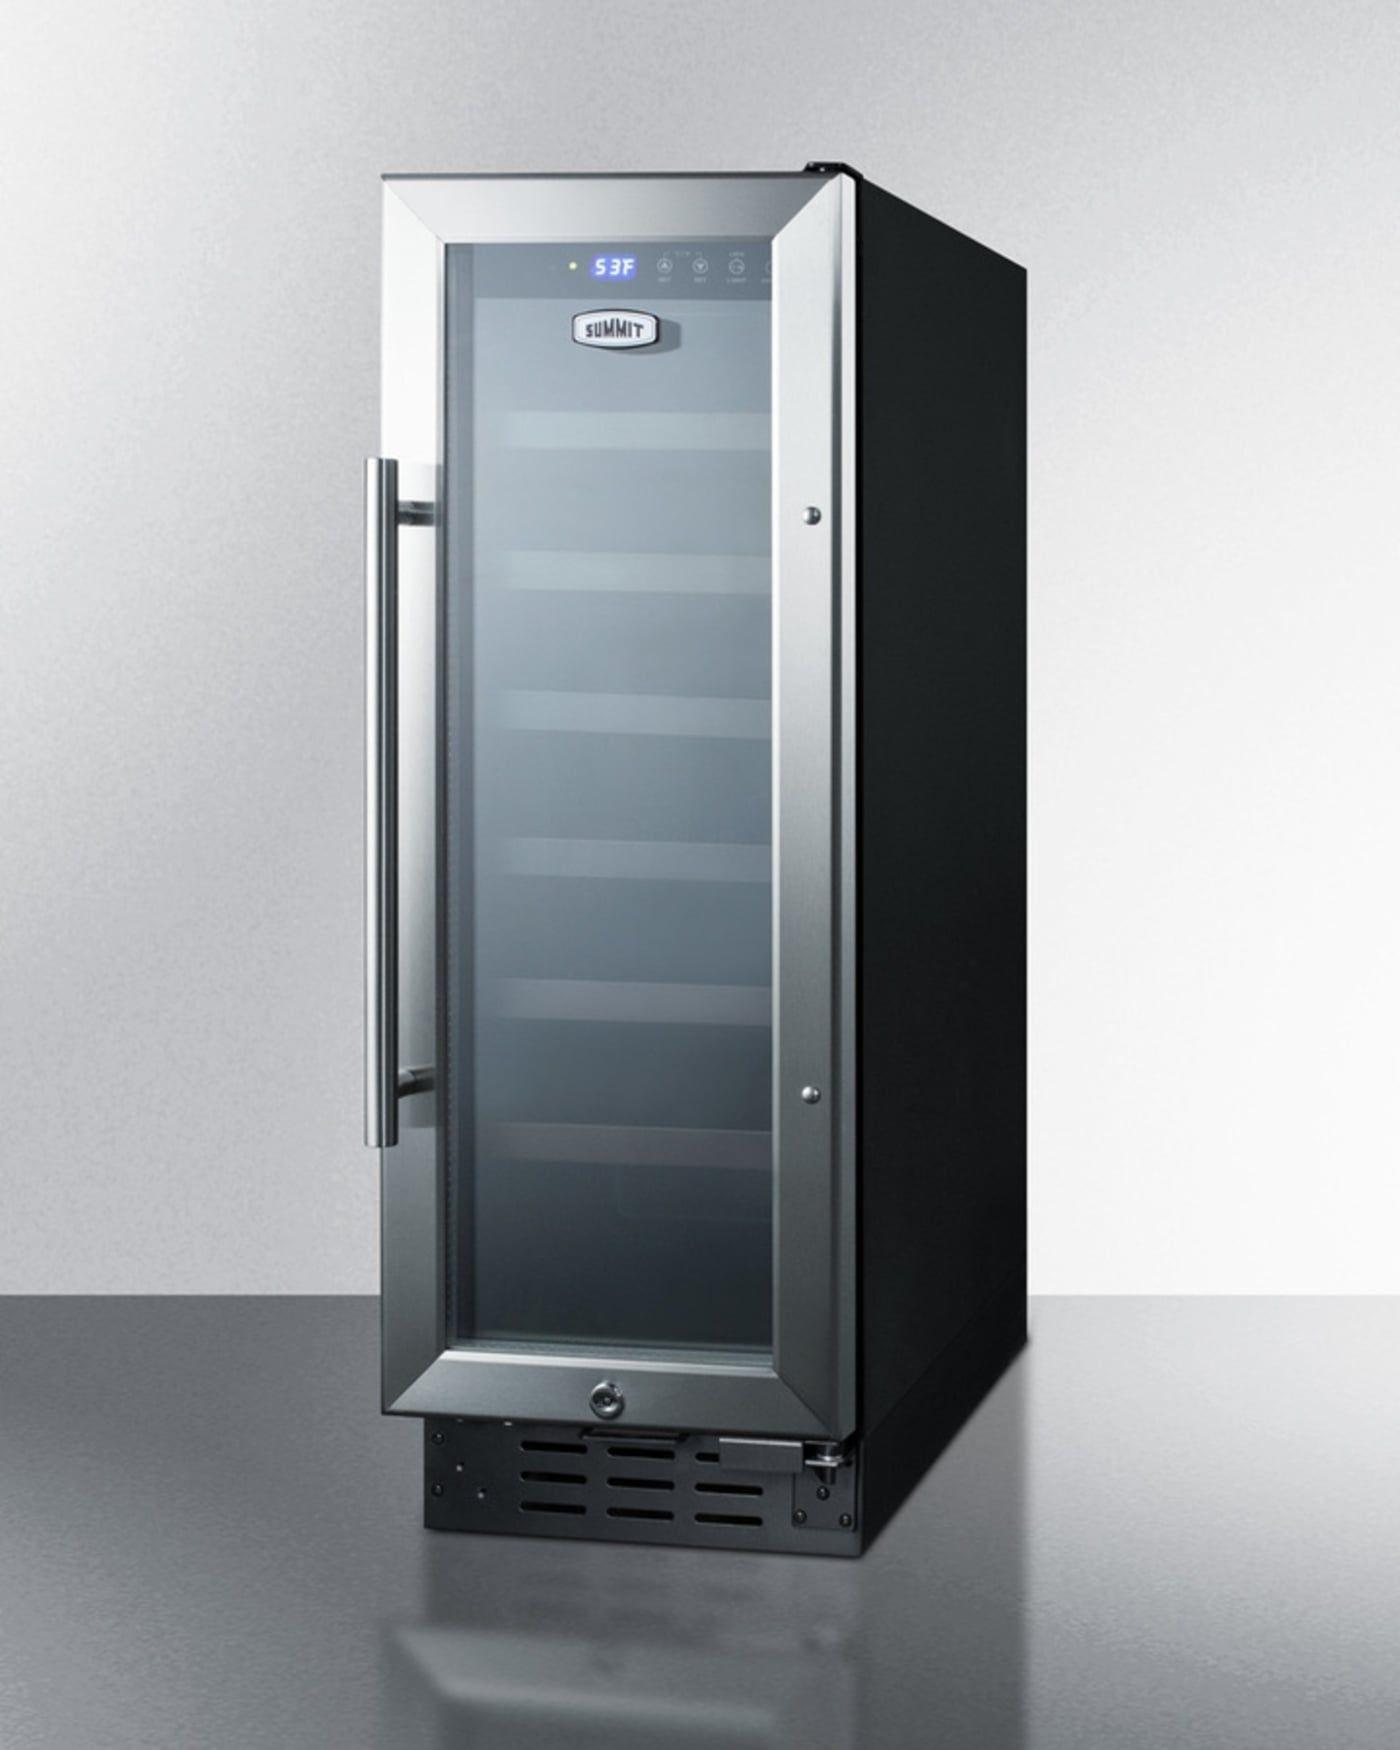 Swc1224b By Summit Wine Chillers Refrigerators Goedekers Com Outdoor Kitchen Appliances Outdoor Kitchen Design Wine Cellar